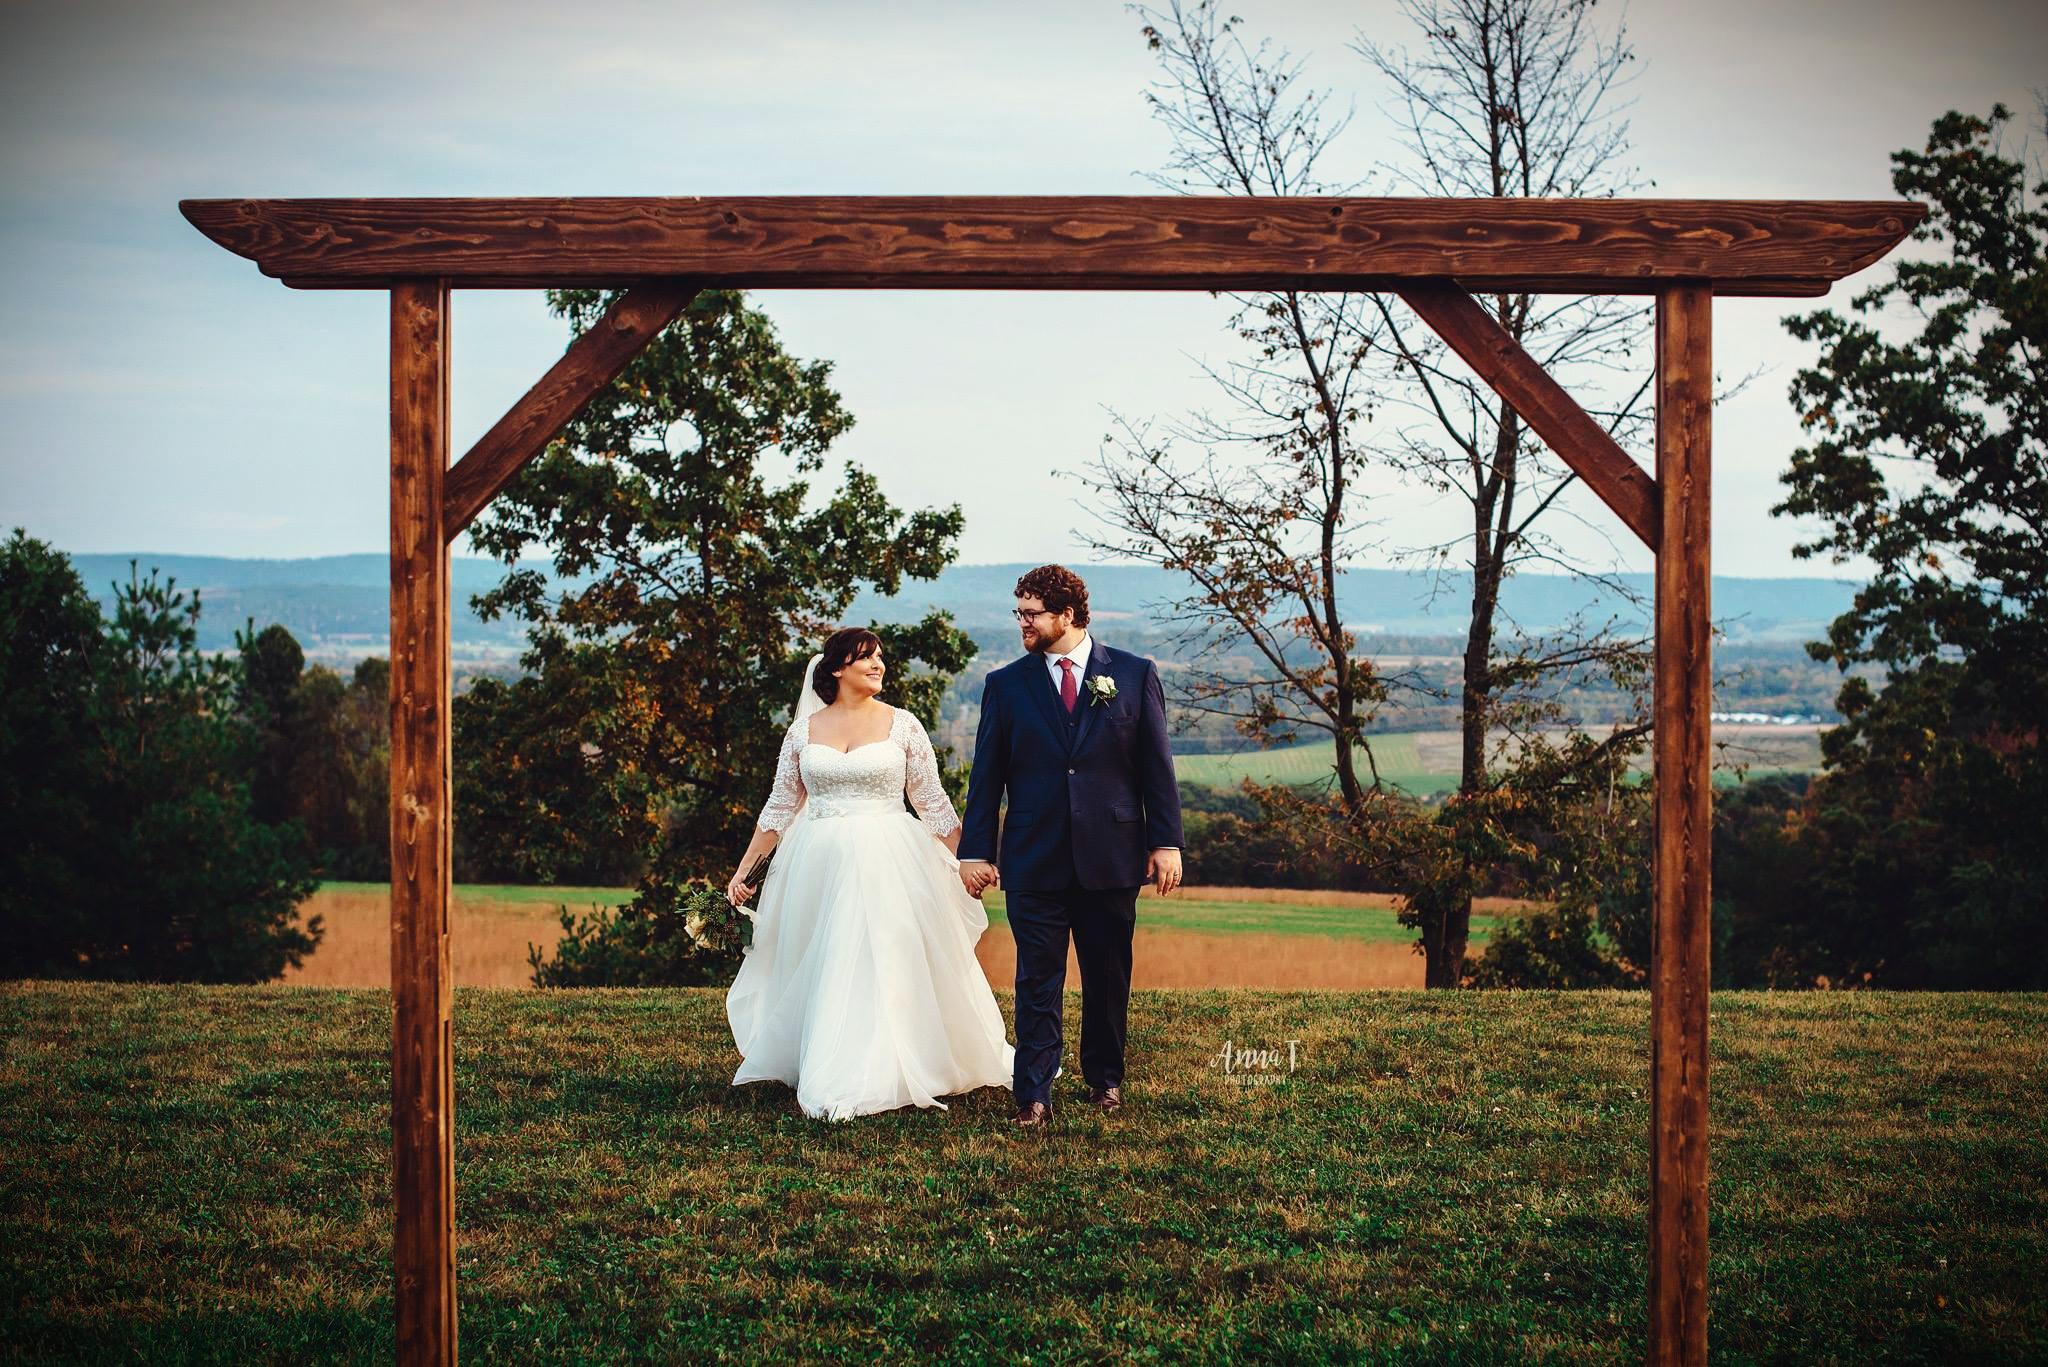 wedding BG 10.6.17 2.jpg